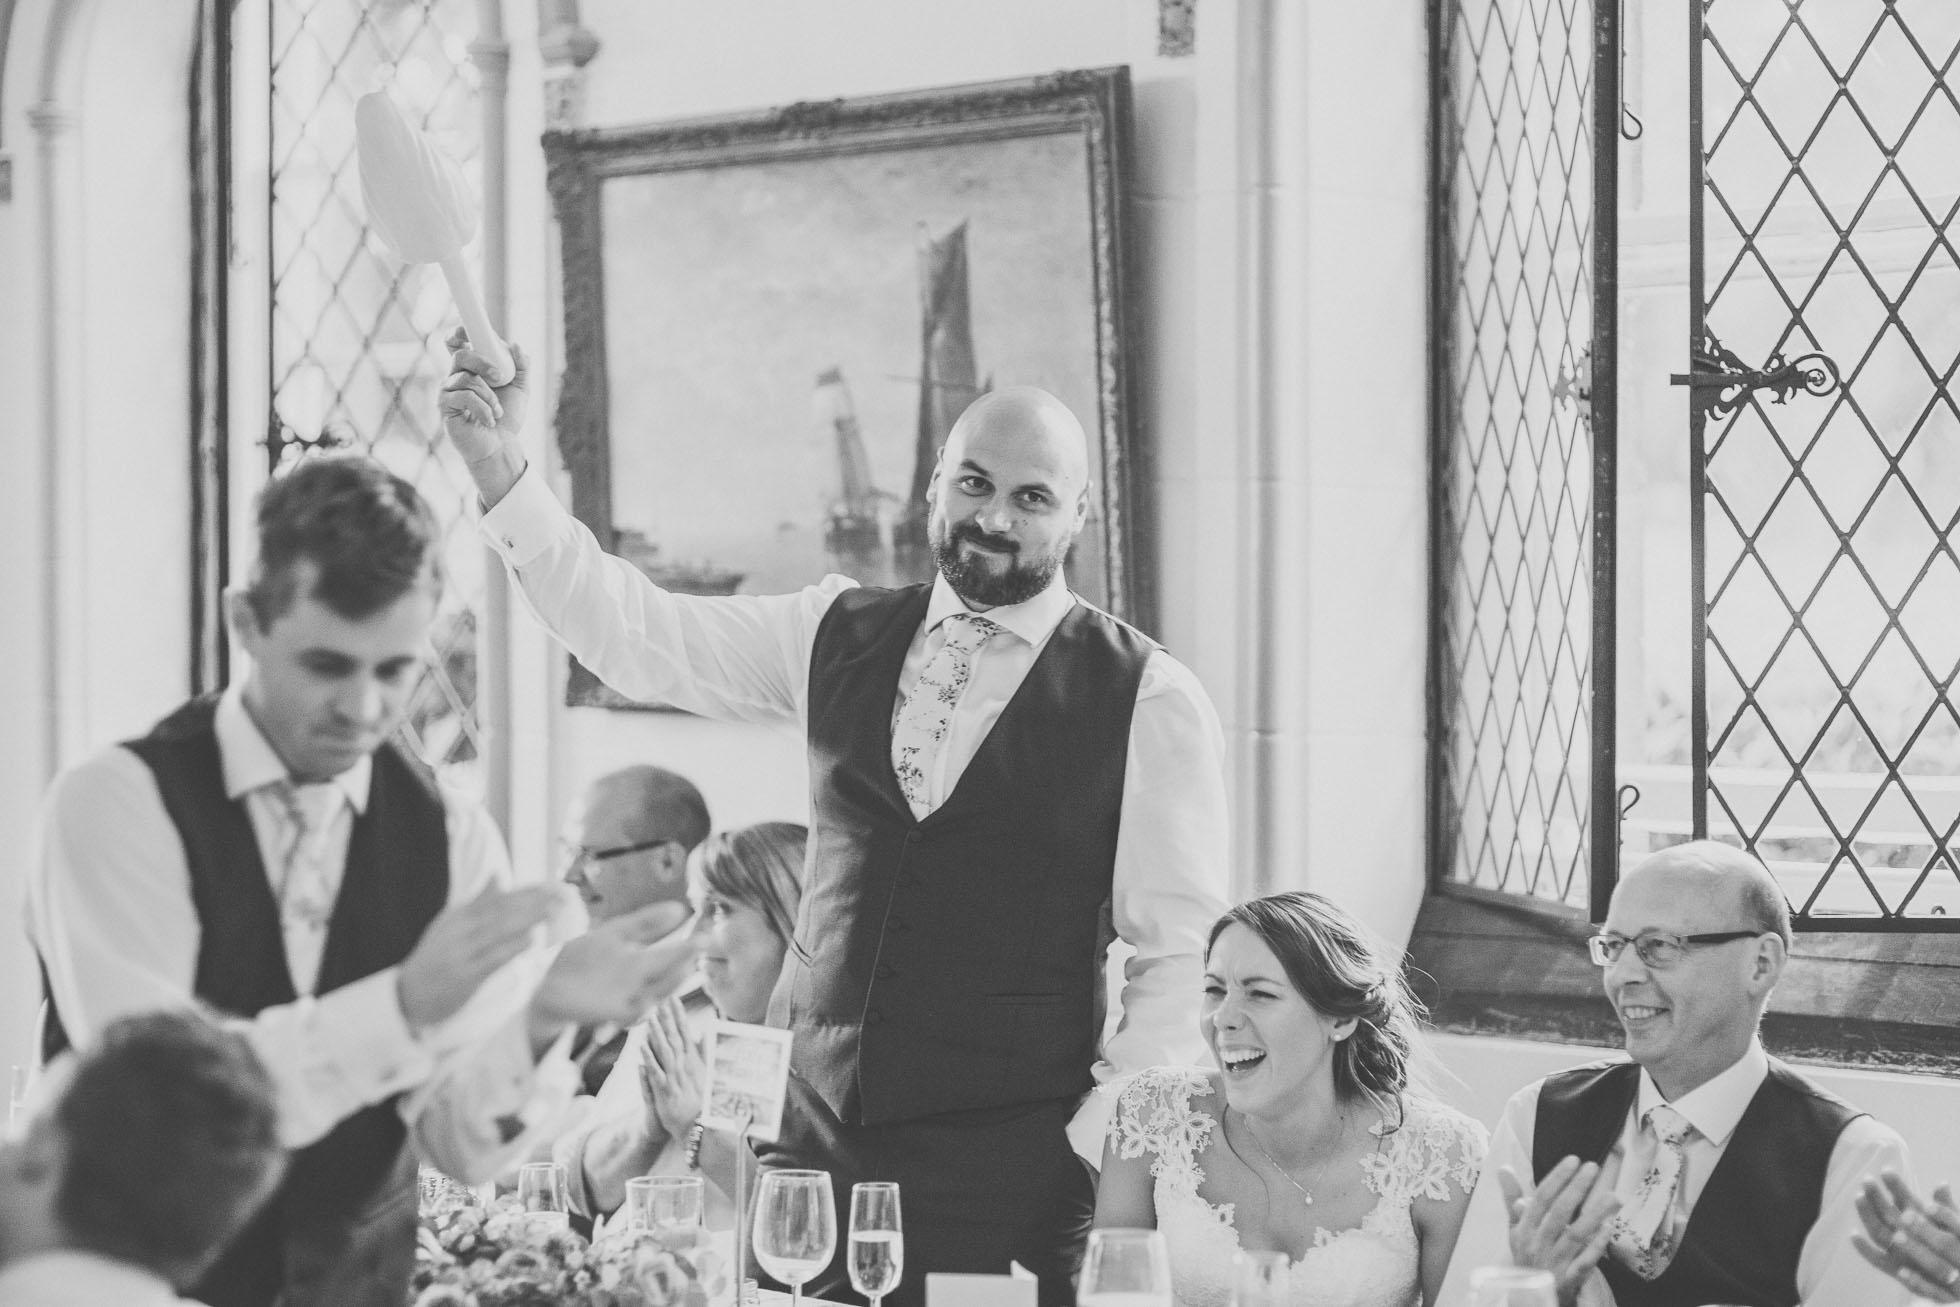 denton-hall-wedding-photographer-62.jpg